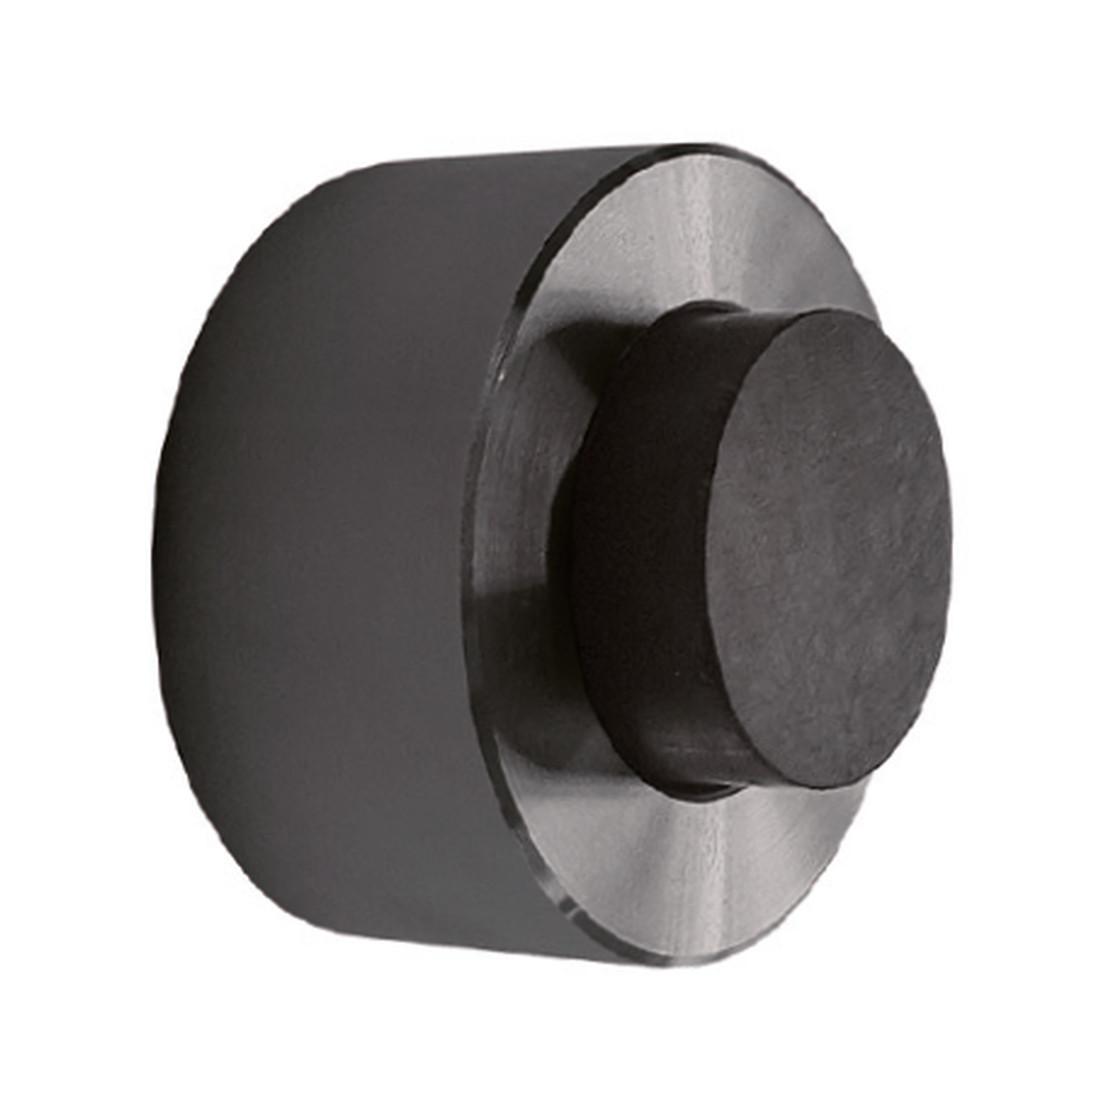 DOOR STOPPER BLACK, ROUND, HANGER BOLT